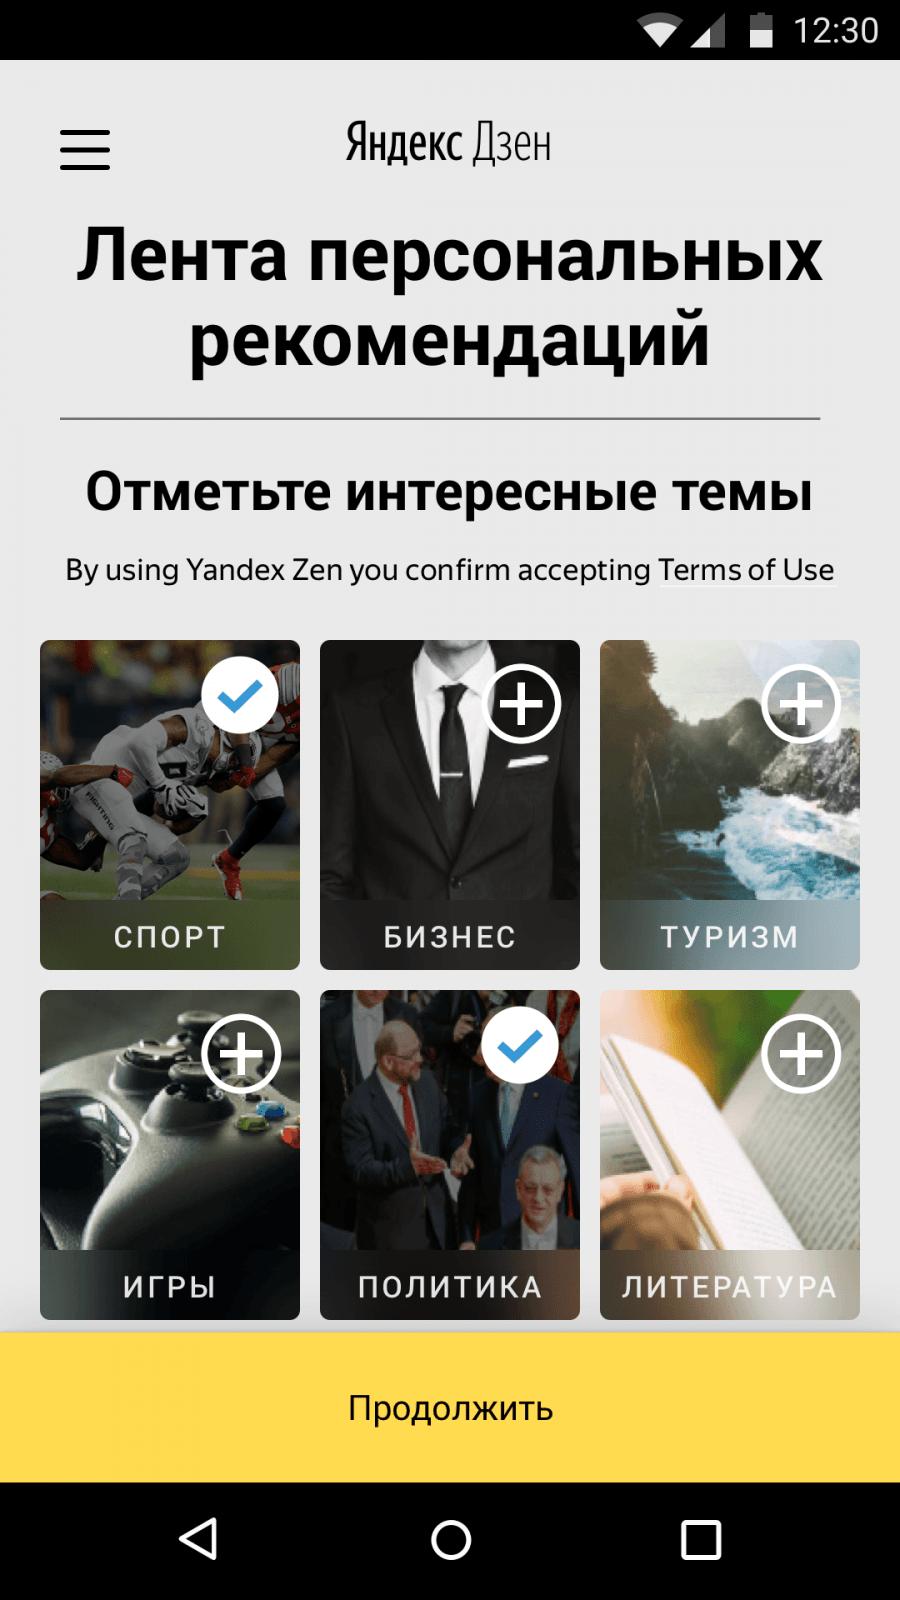 Яндекс Дзен стал приложением (Onboarding ru)